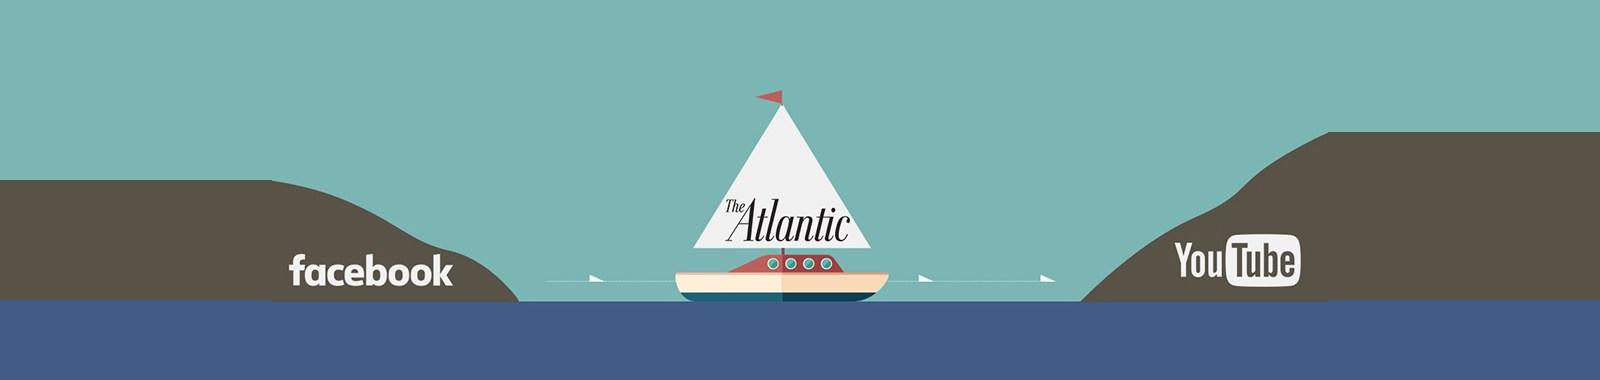 The-Atlantic-Sail-eye